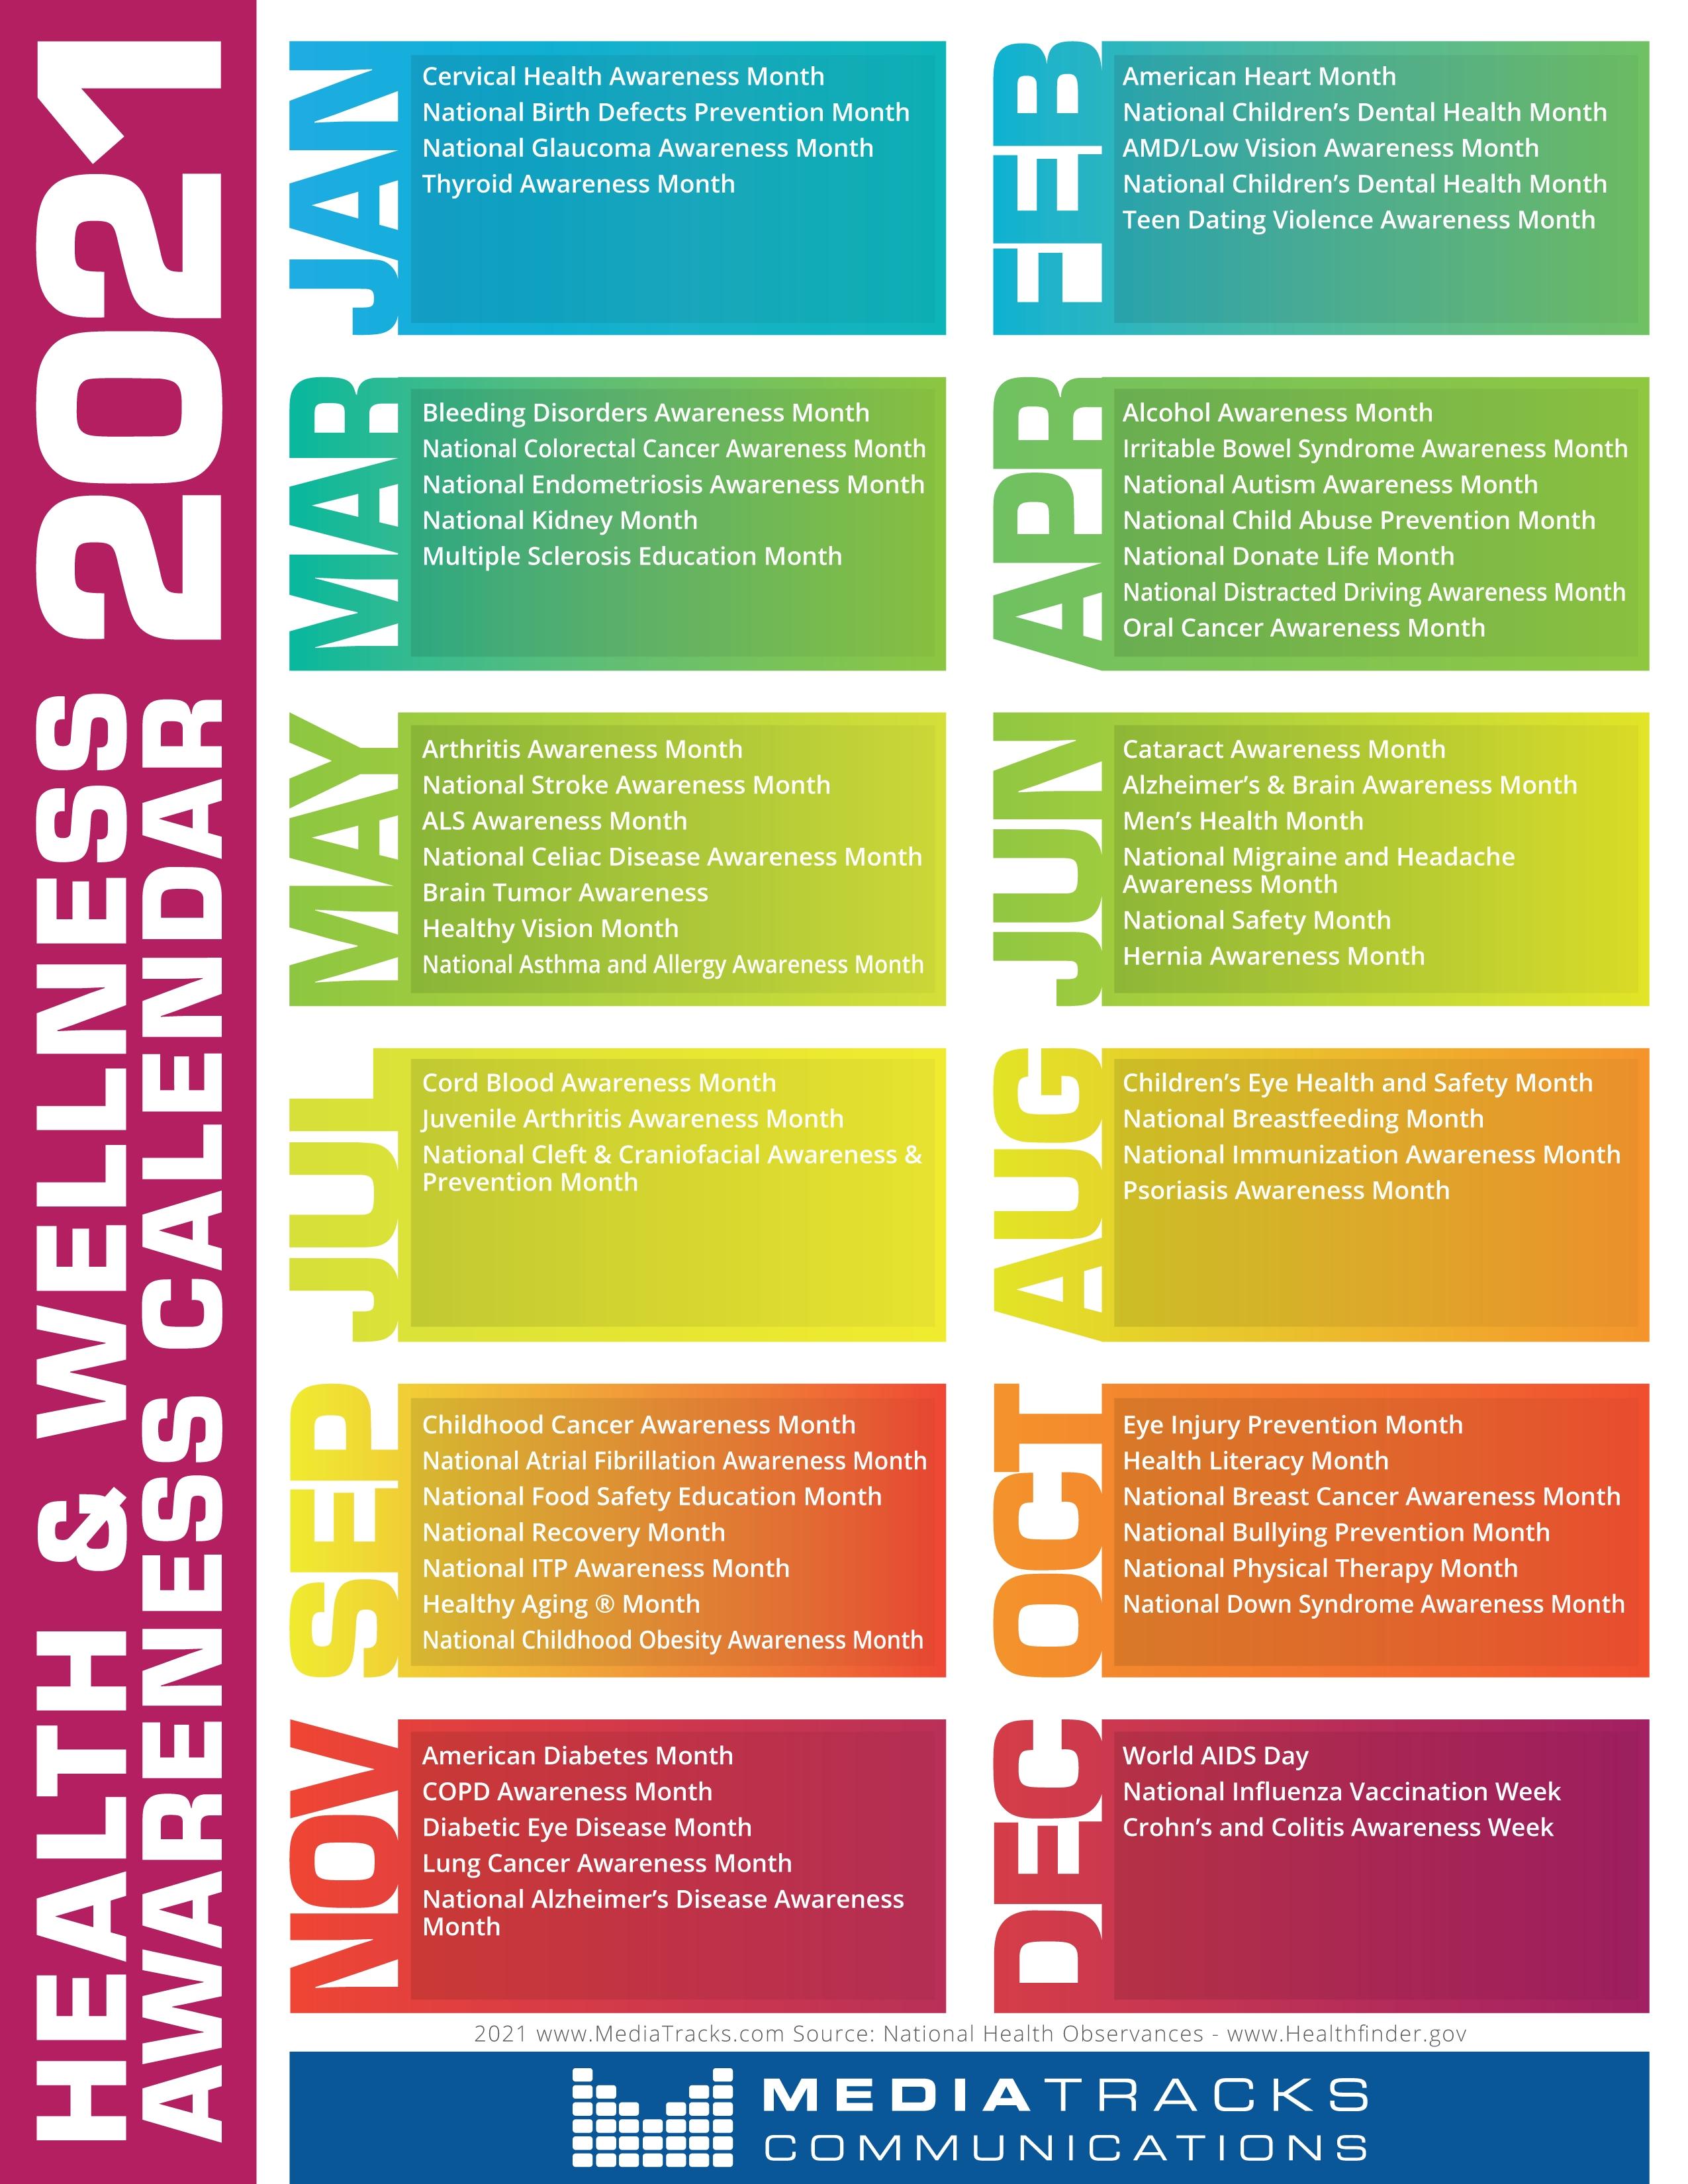 2021 Health & Awareness Calendar Mediatracks   5Th Annual National Awareness Calendar For 2021